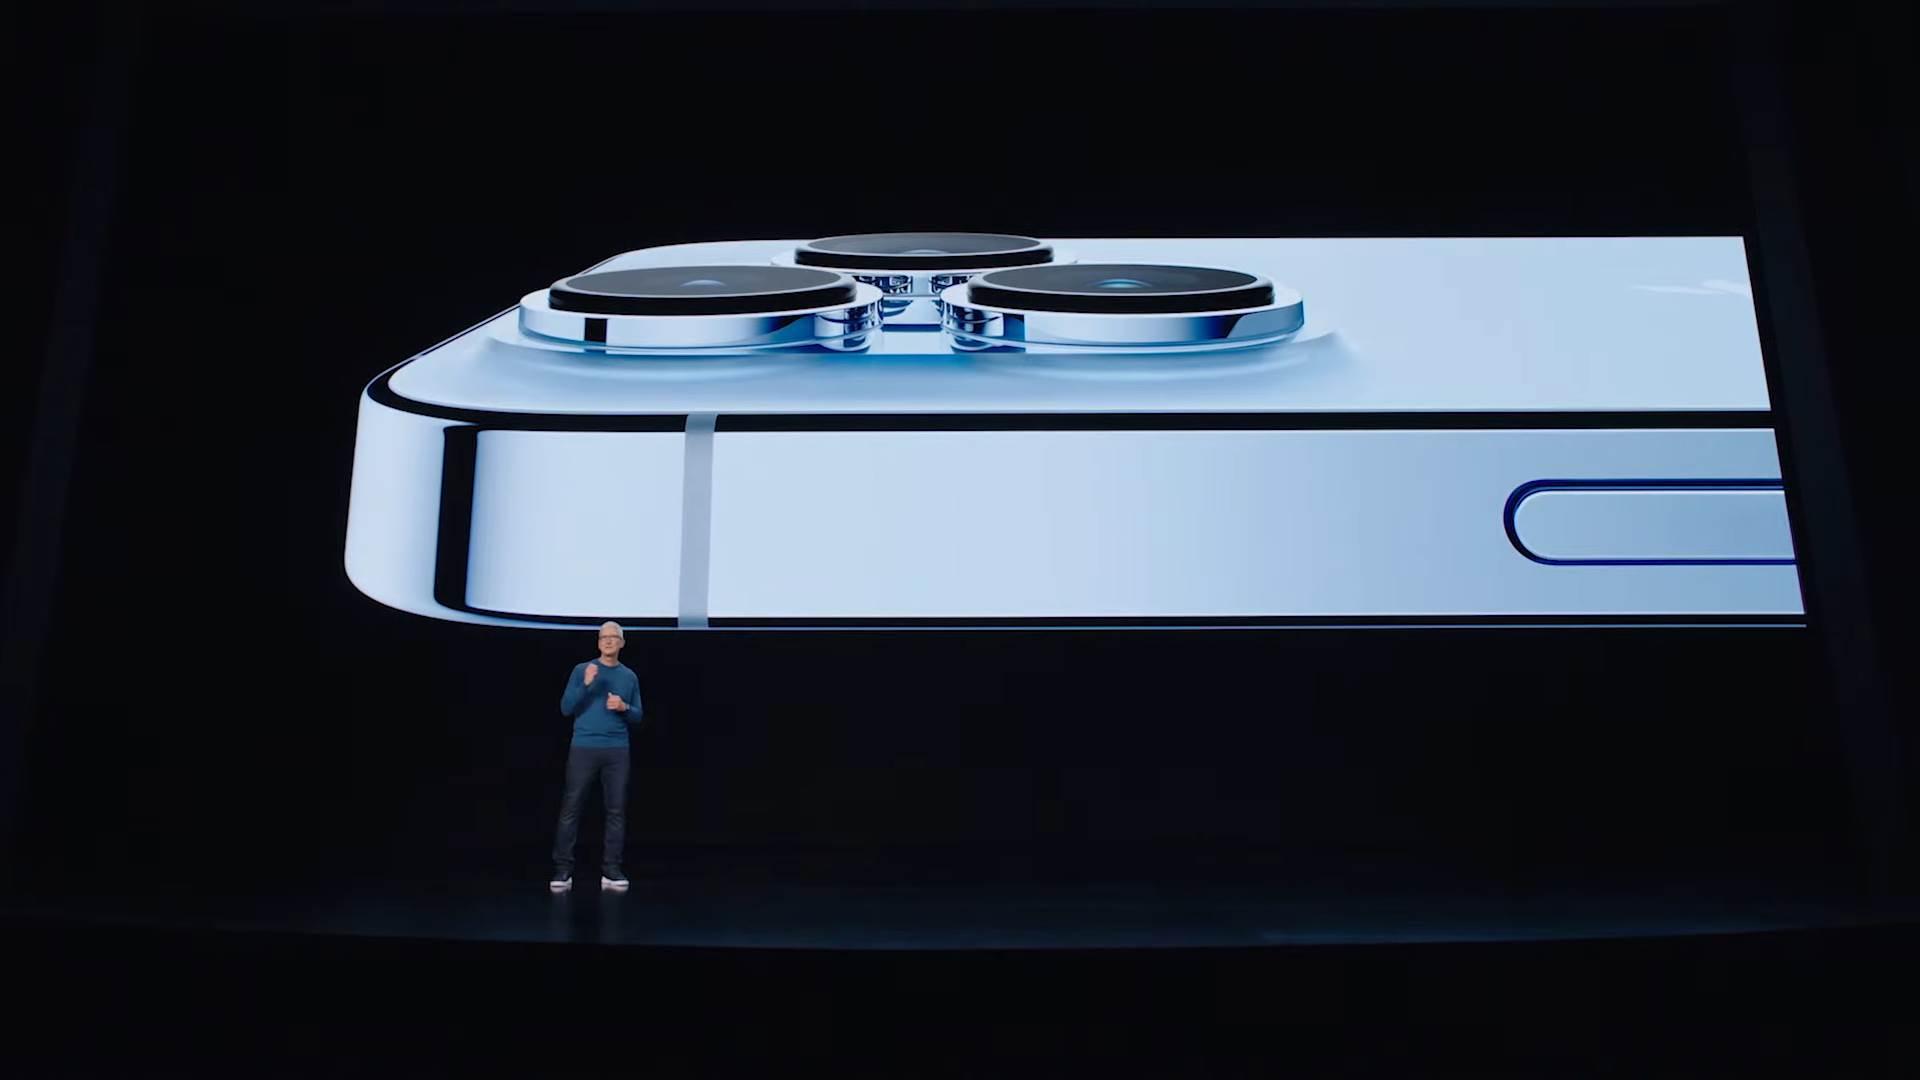 iPhone 13 Pro Tim Kuk - SmartLife / Apple